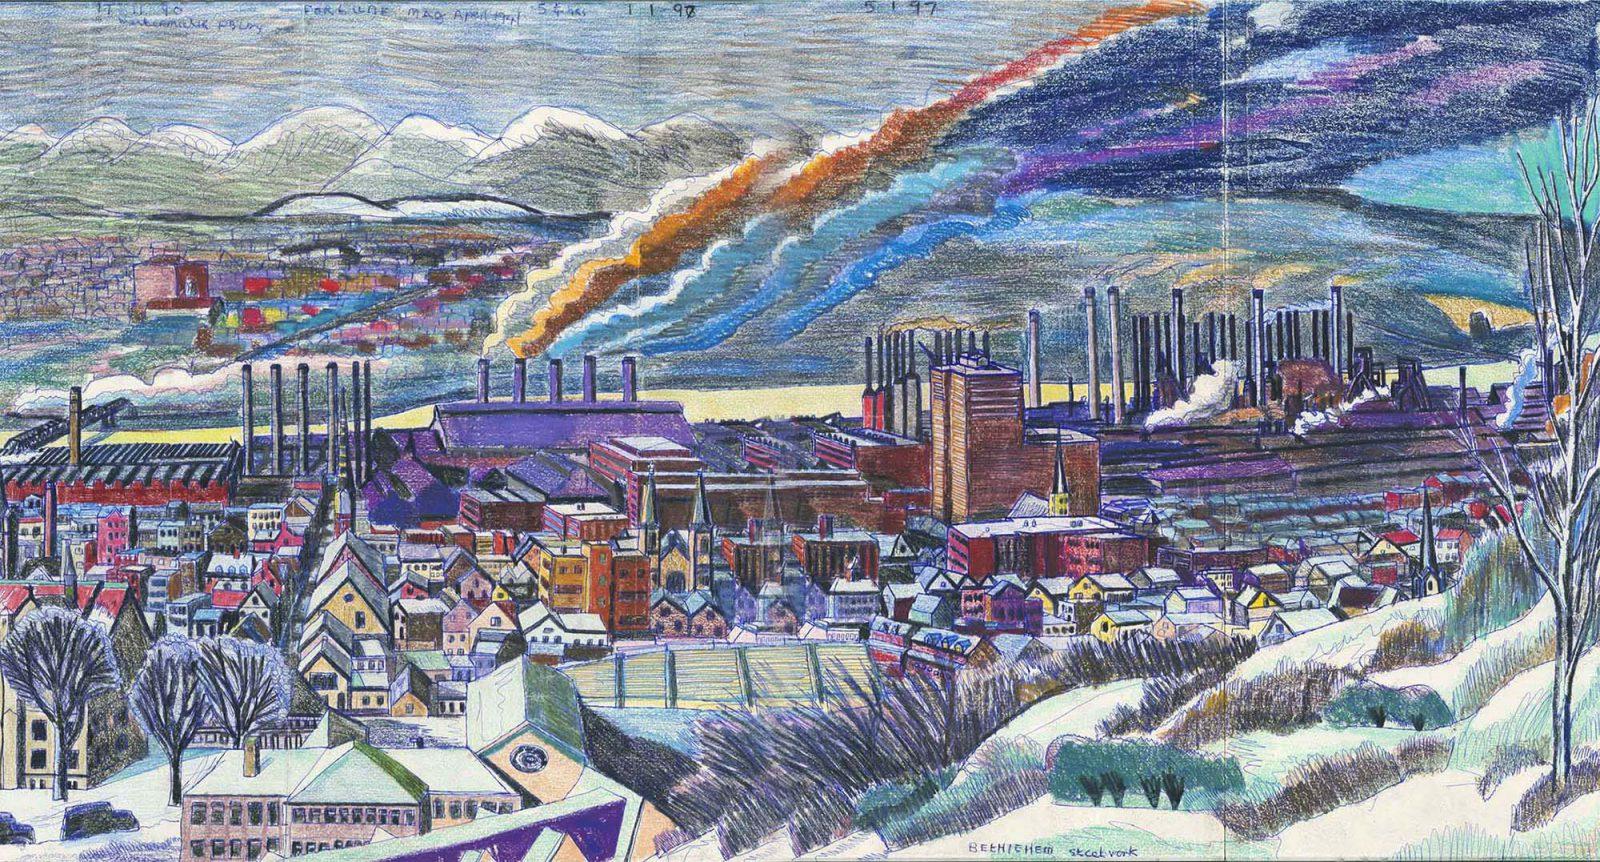 David Bassadone. Bethlehem Steelworks